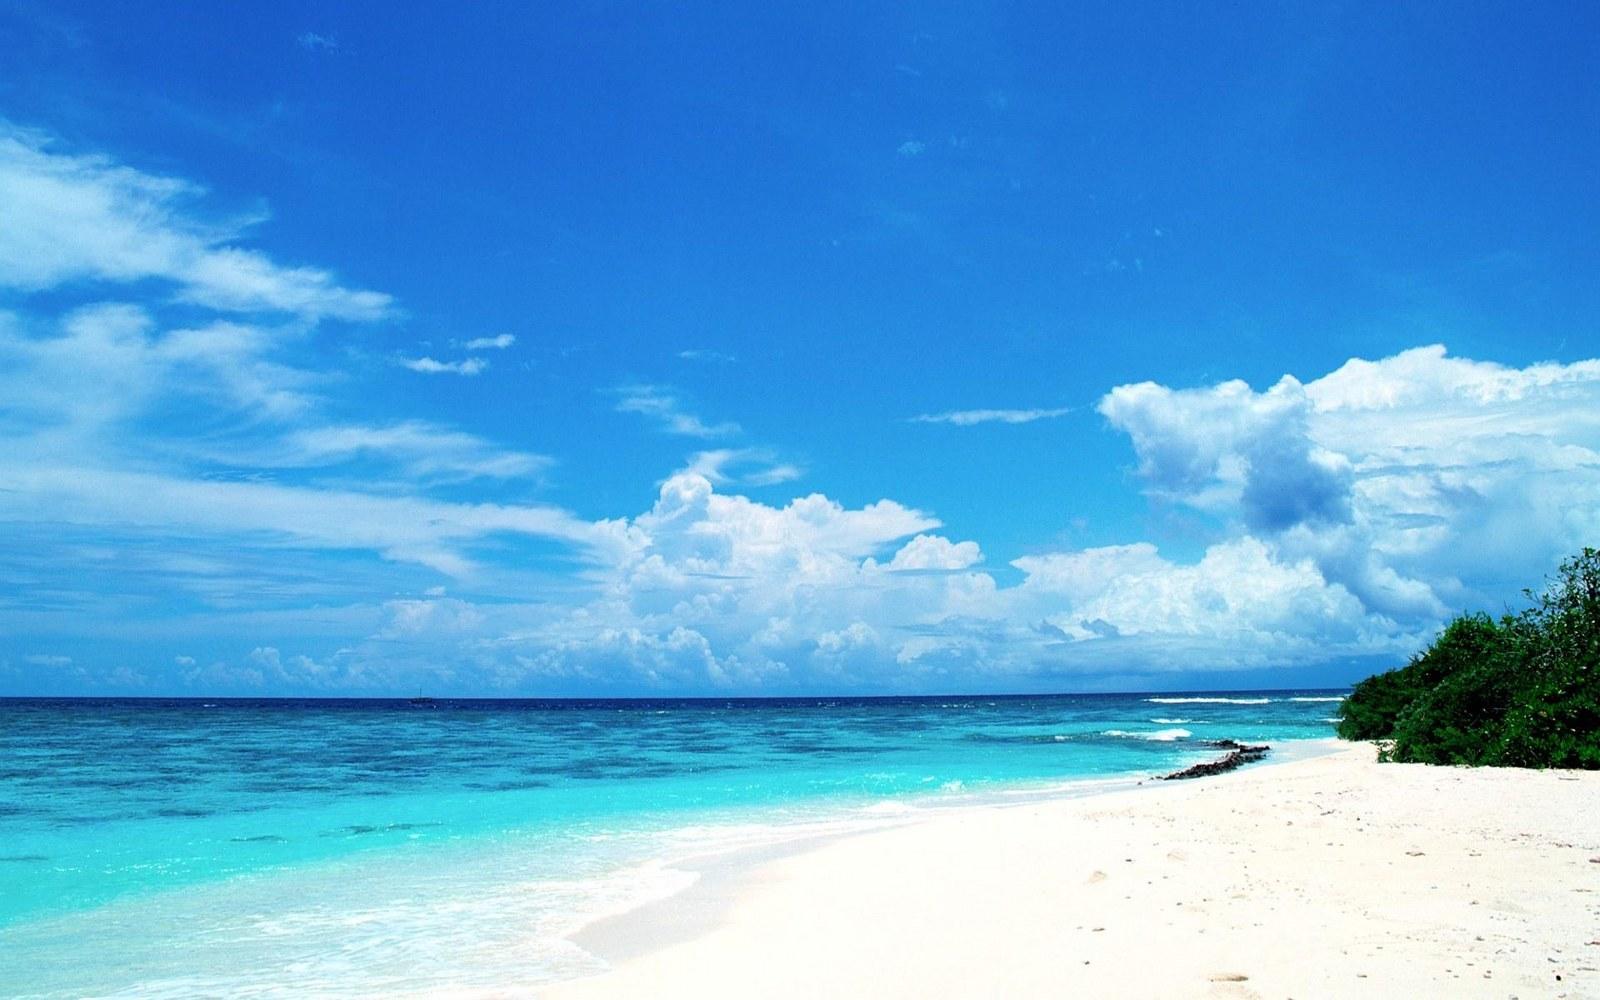 Free Download Beach Landscape Scene Wallpapers55com Best